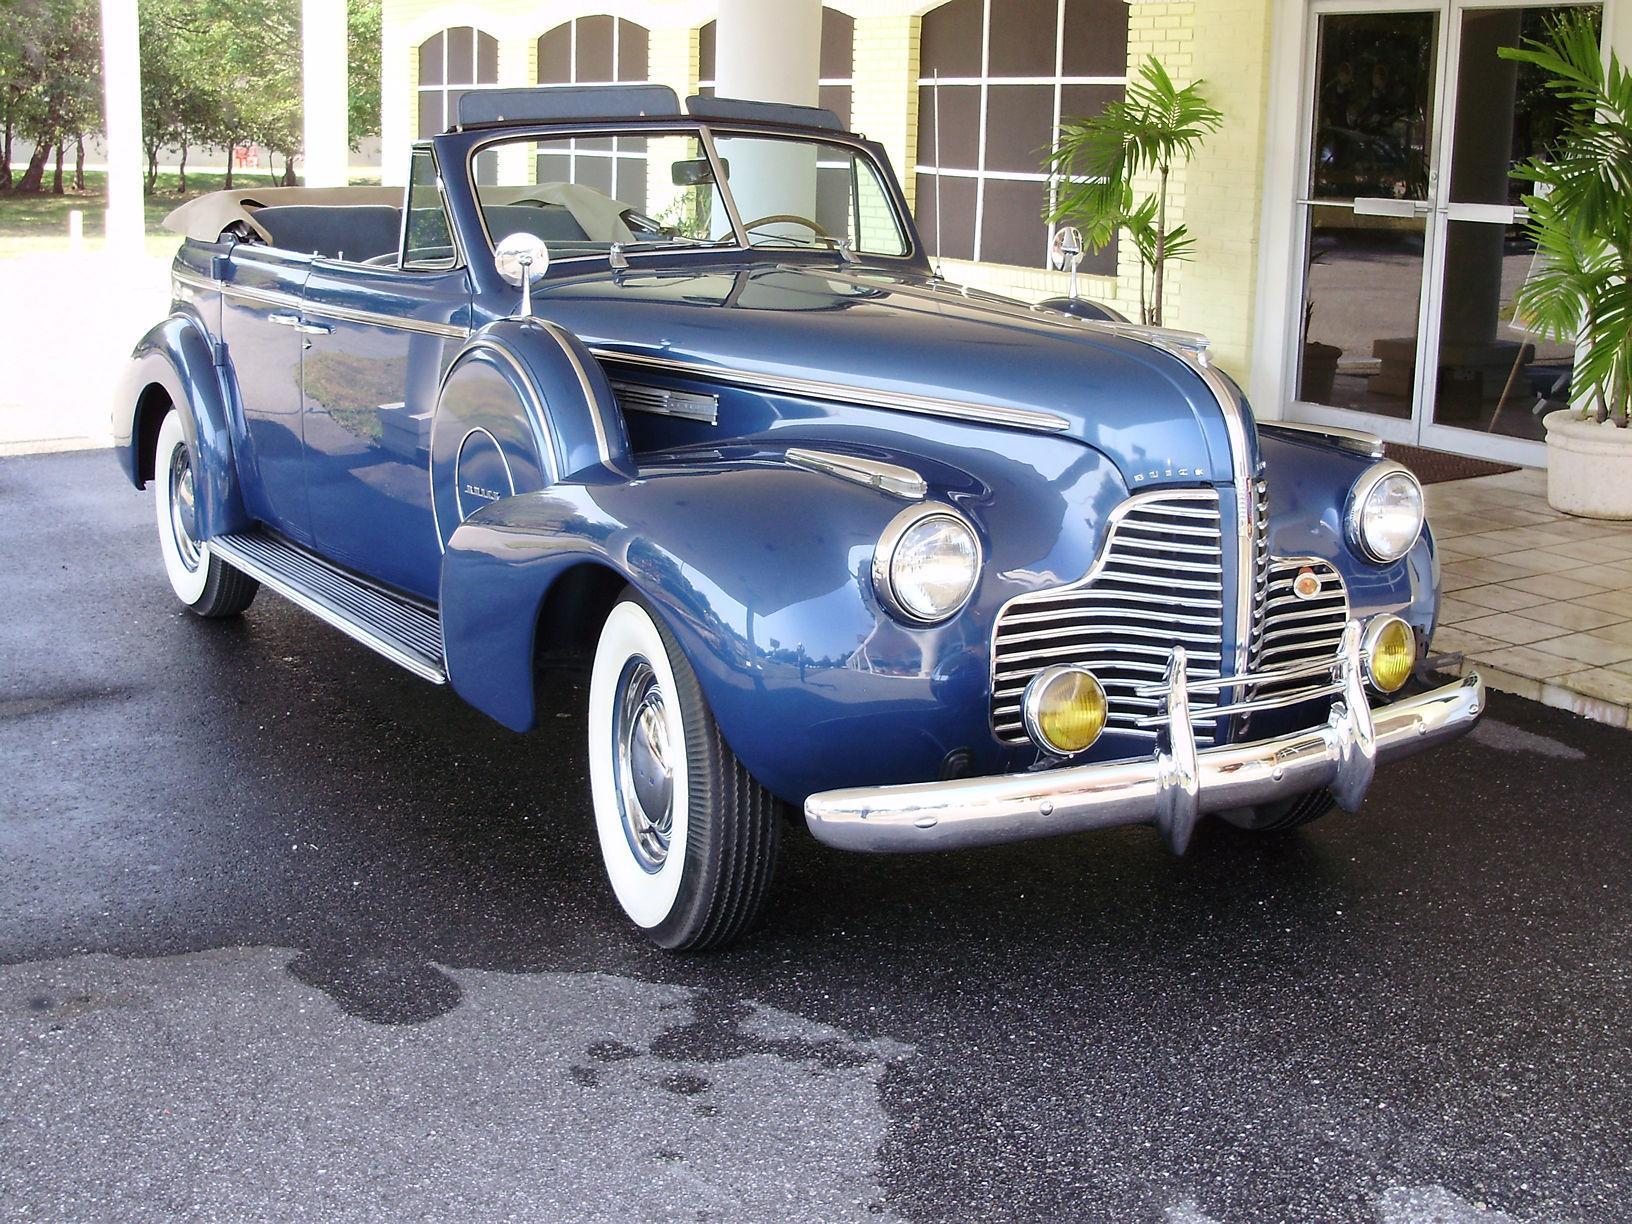 1940 BUICK CENTURY CONVERTIBLE SEDAN - Vintage Motors of Sarasota Inc. #9